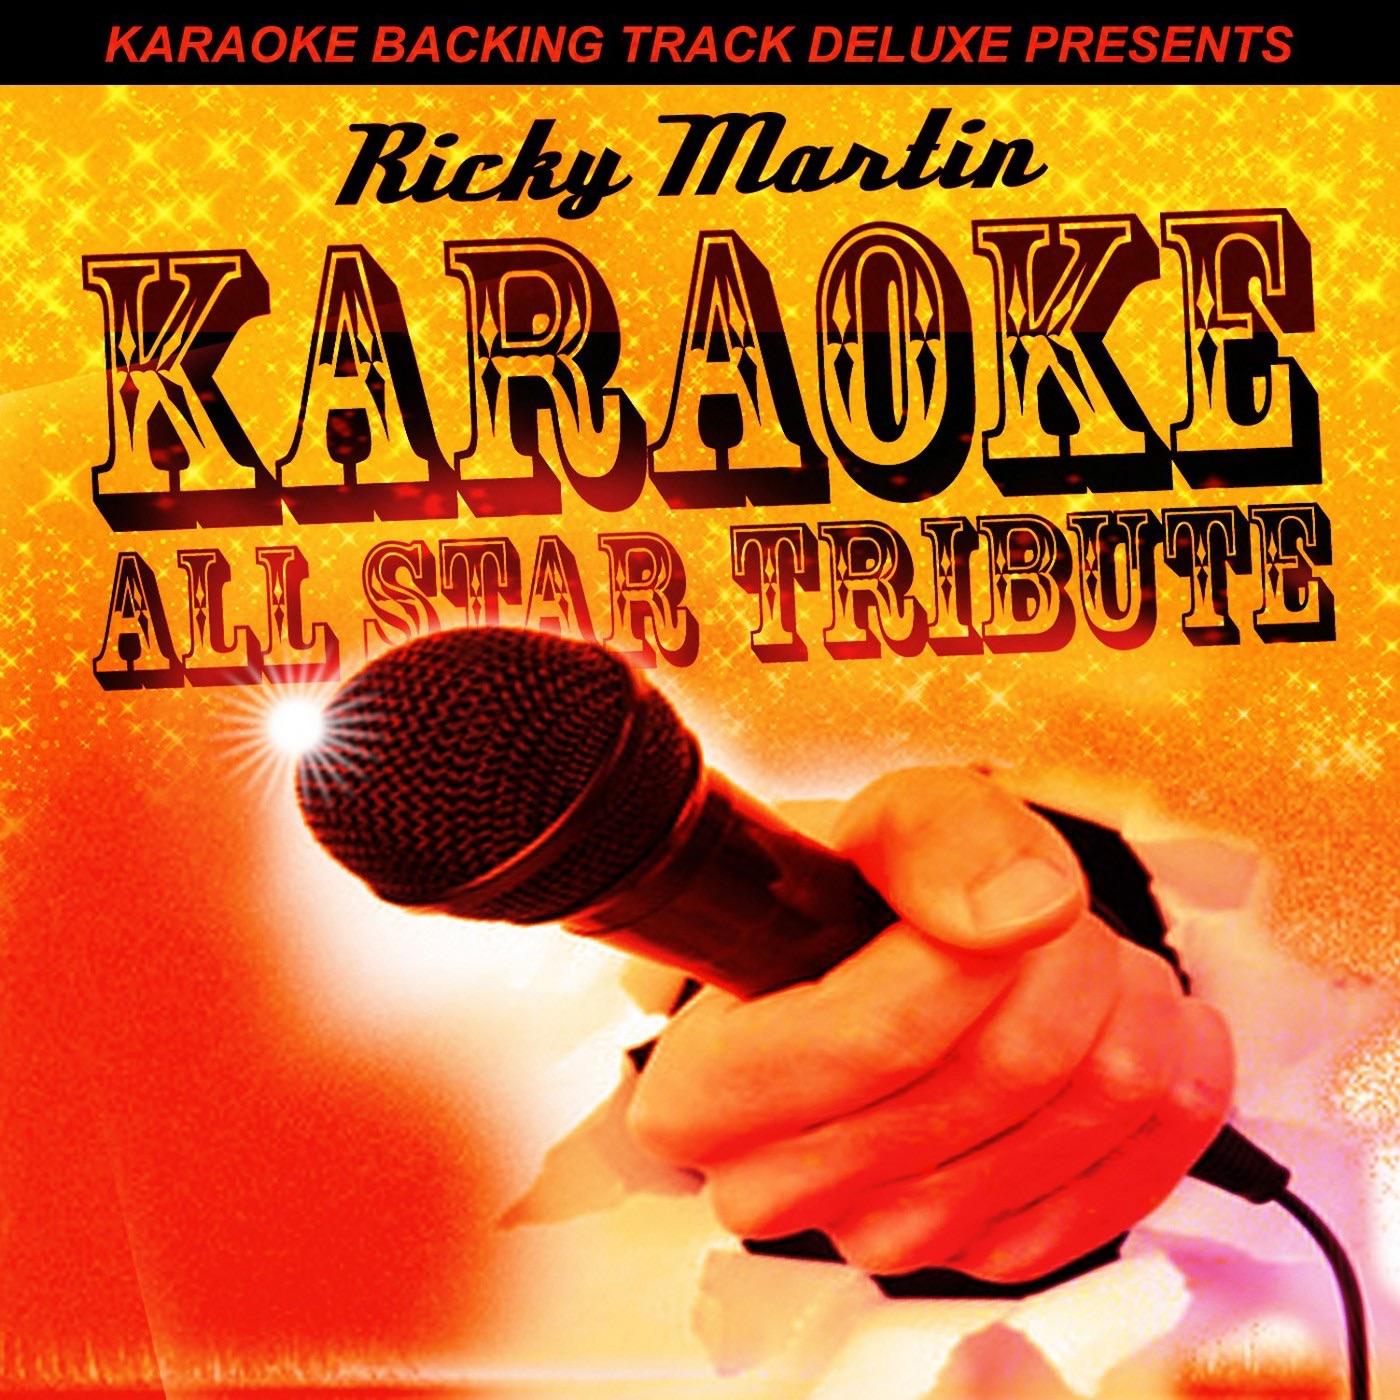 Karaoke Backing Track Deluxe Presents: Ricky Martin